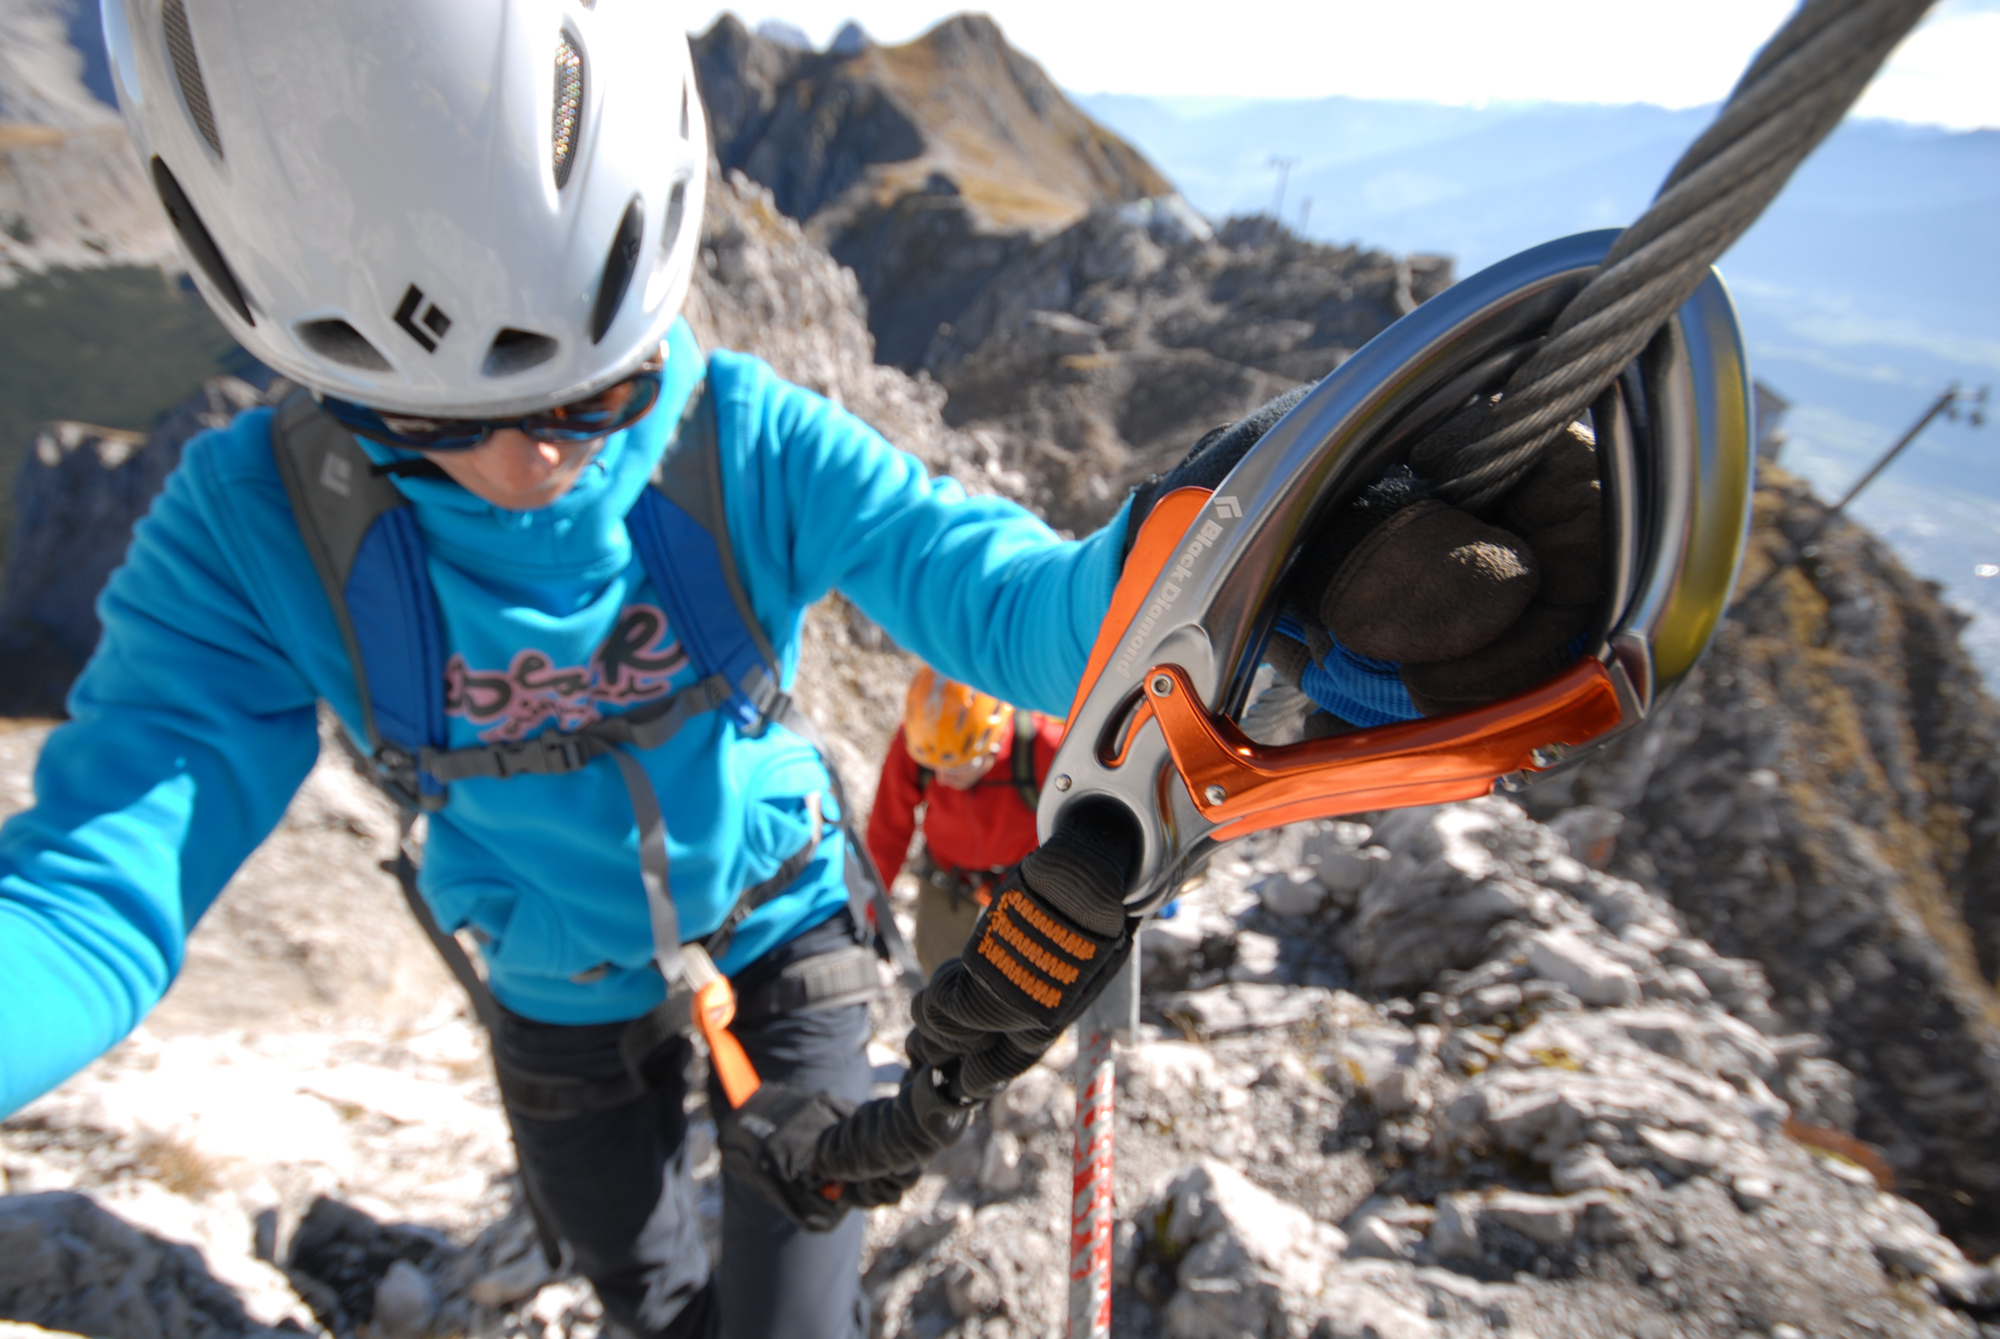 Black Diamond Klettersteigset : Klettersteigset norm bergundsteigen